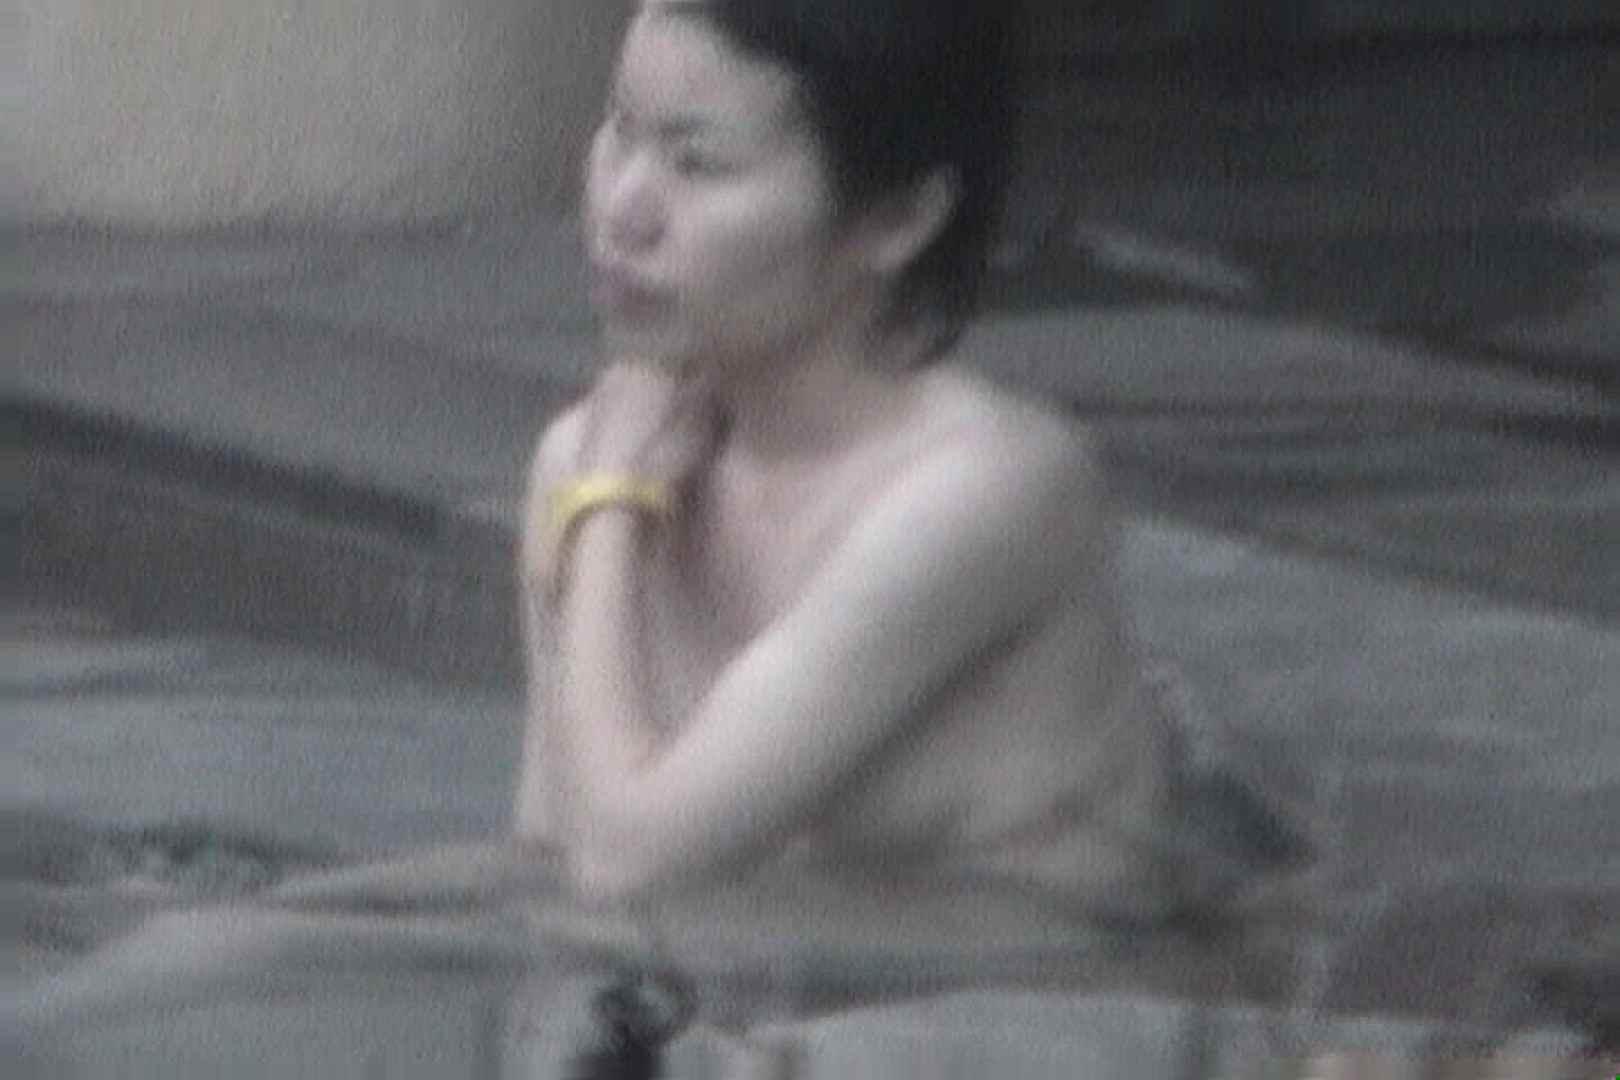 Aquaな露天風呂Vol.556 露天風呂編  99PIX 74